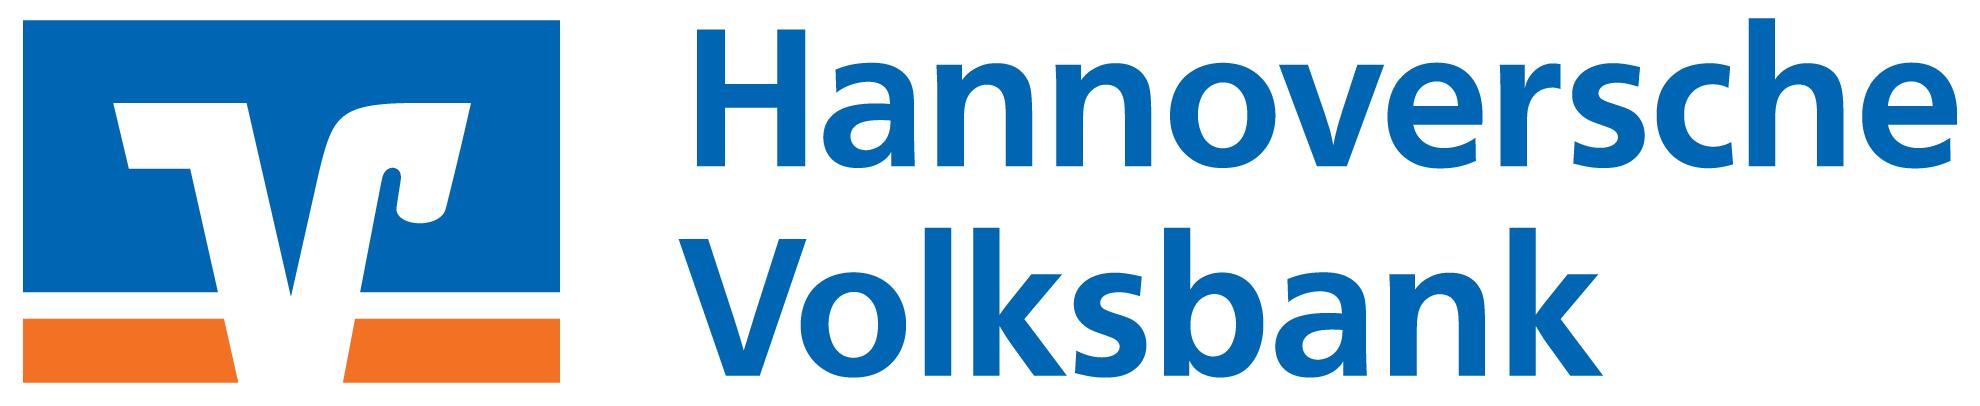 Hannoversche Volksbank eG KompetenzCenter Langenhagen